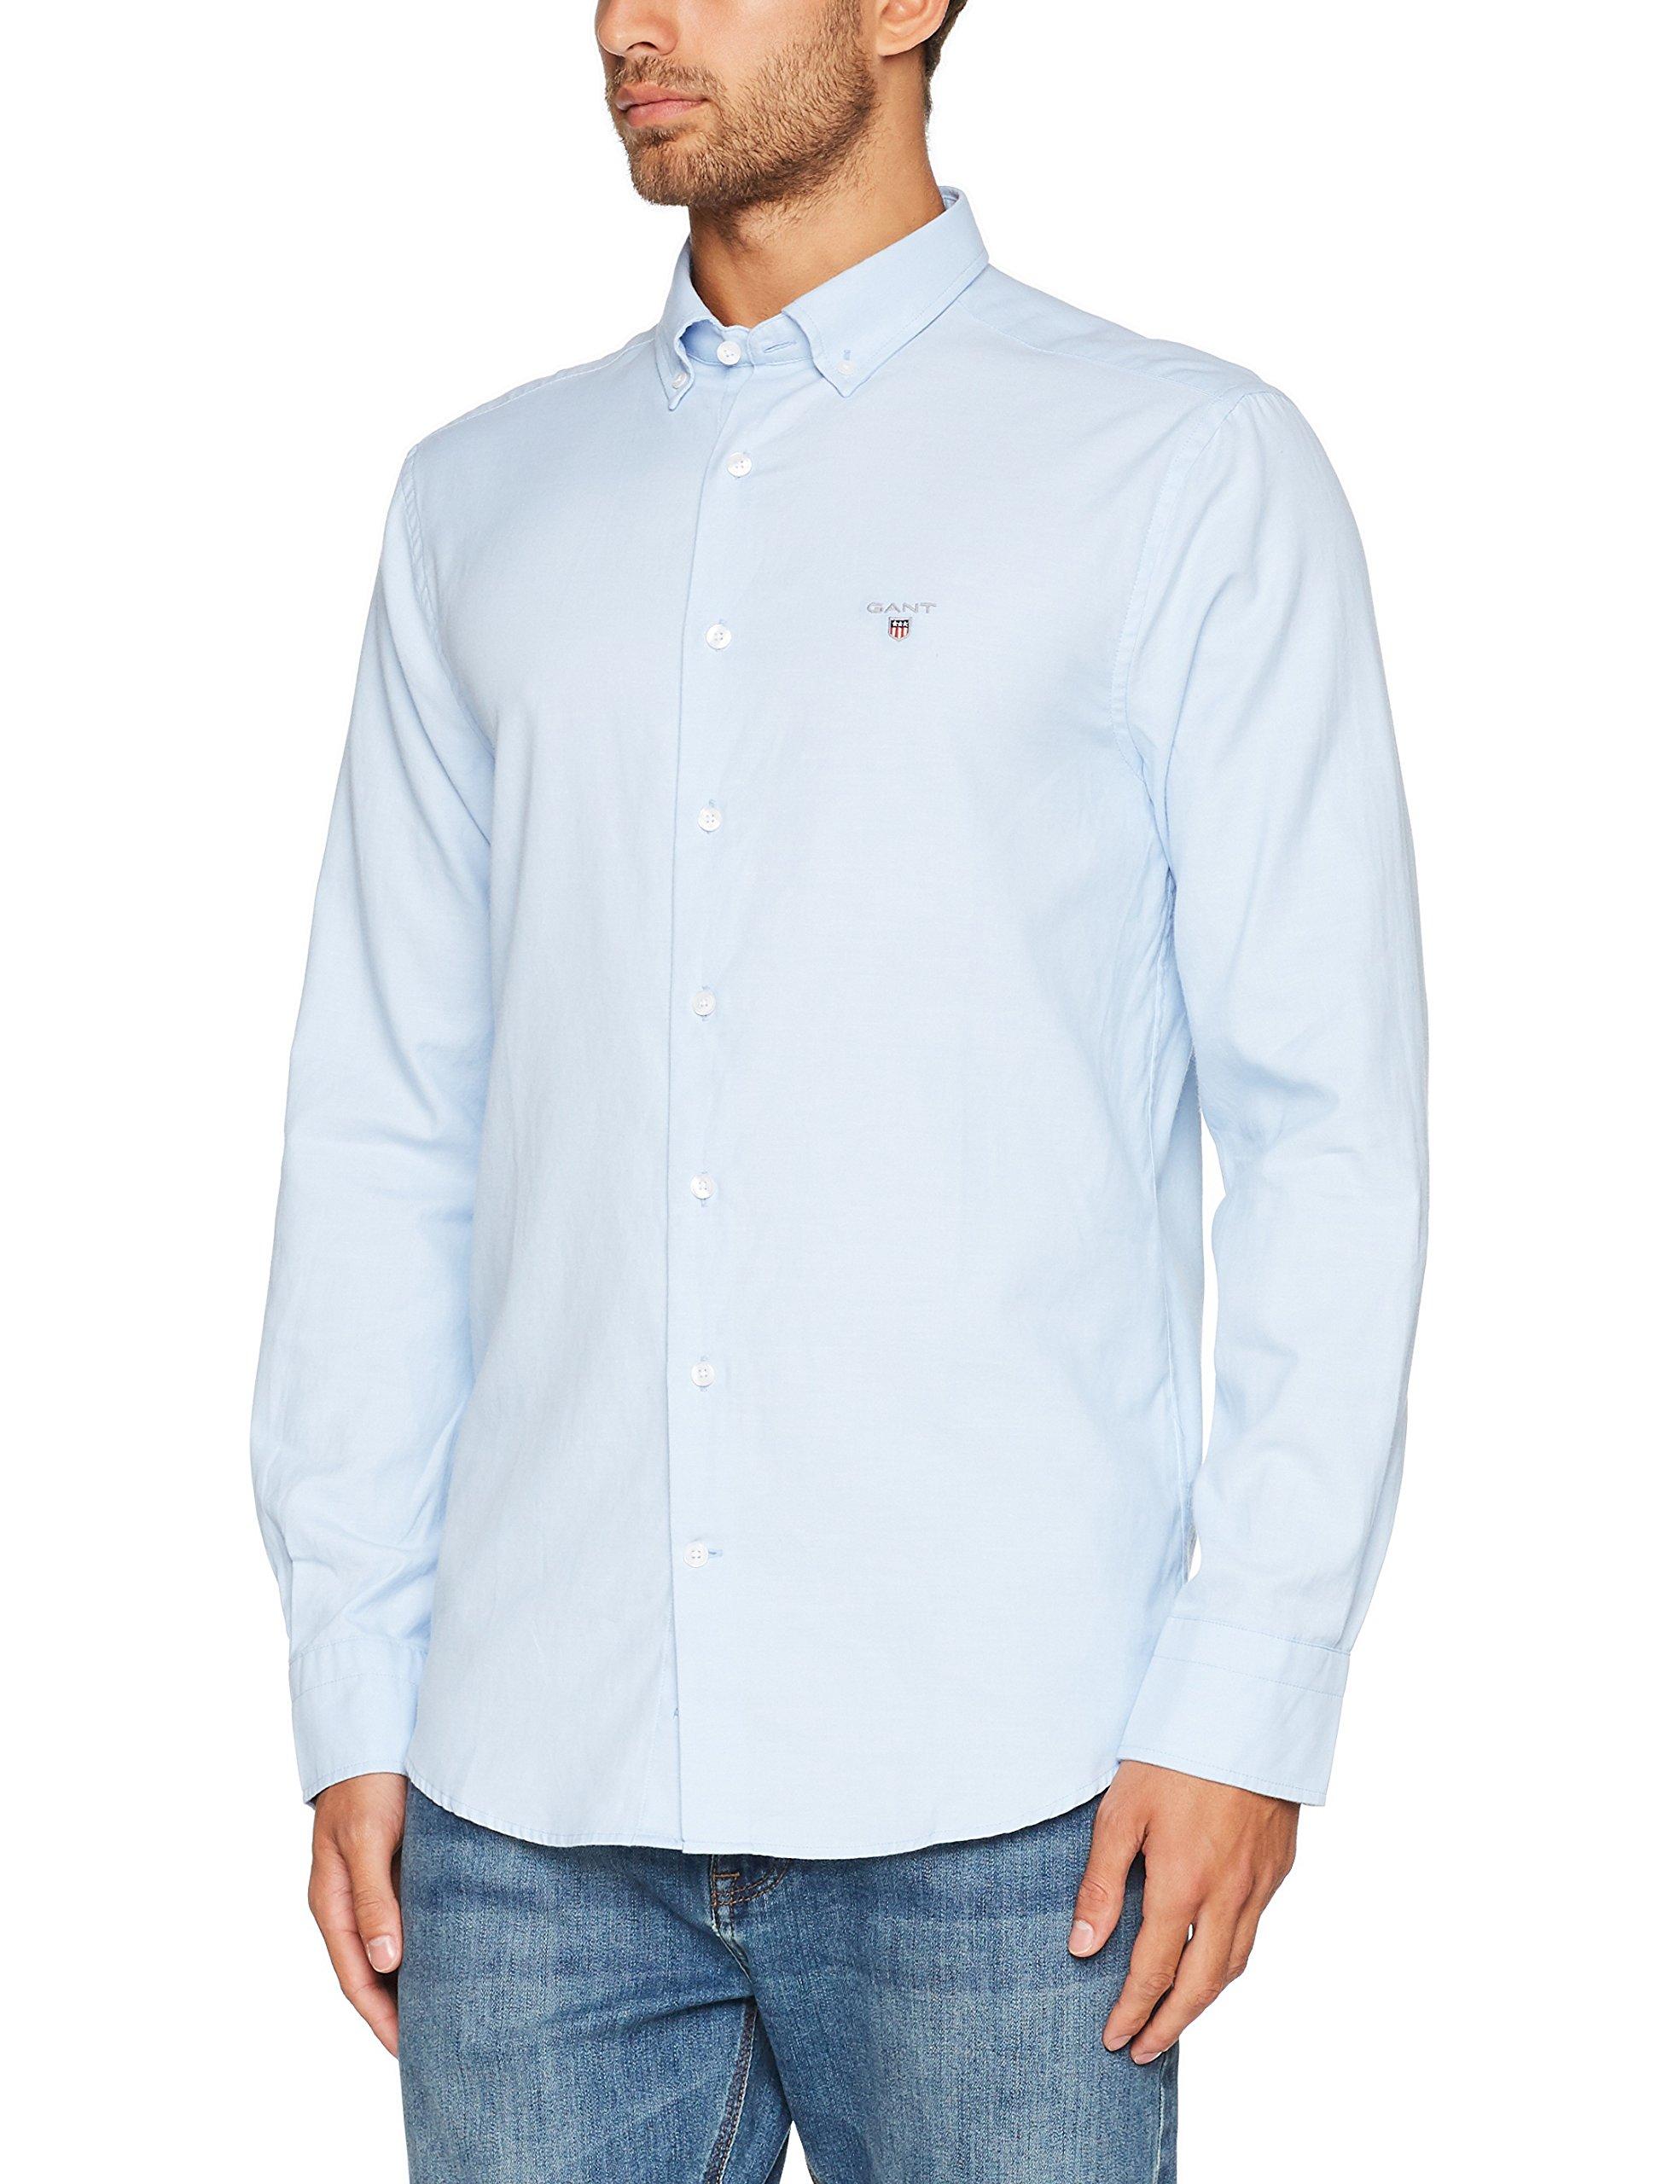 Gant CasualBleucapri large Wool Prep Chemise Tech BlueXxx Homme Shirt clFKJ1T